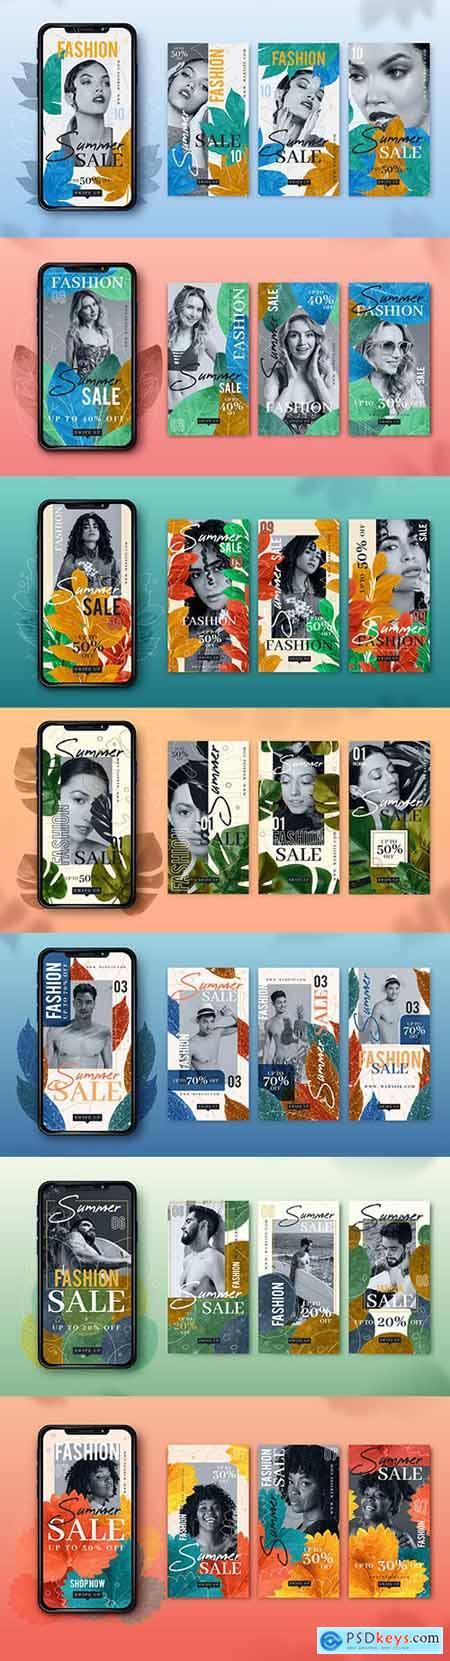 Fashion summer sale post on Instagram smartphone design